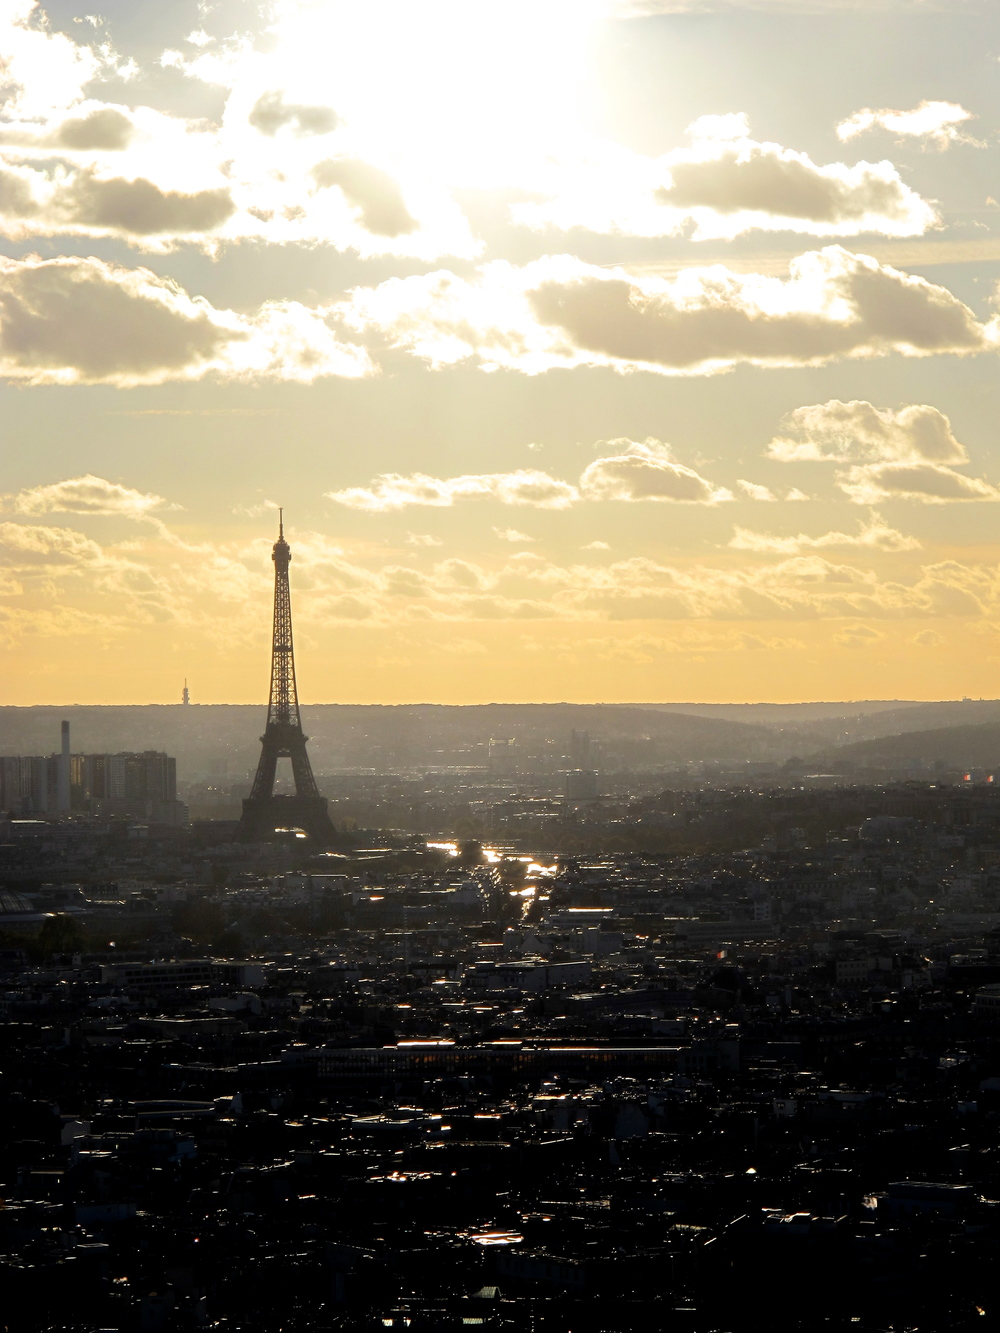 EiffelTowerView.jpg